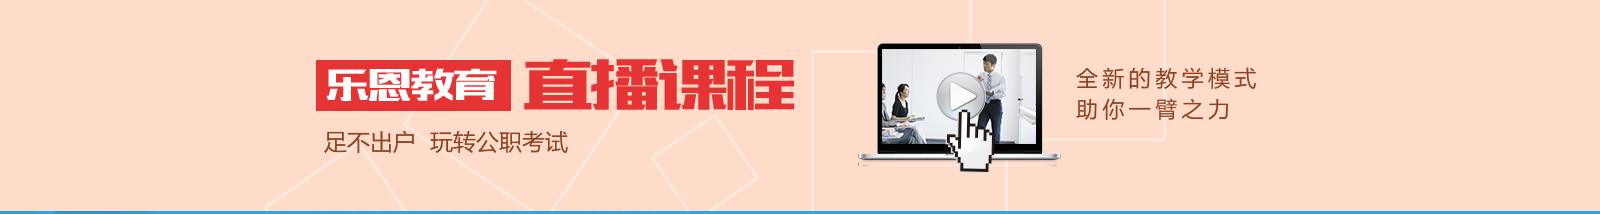 long8龍8國際首頁long8龍8國際 首頁考前培訓